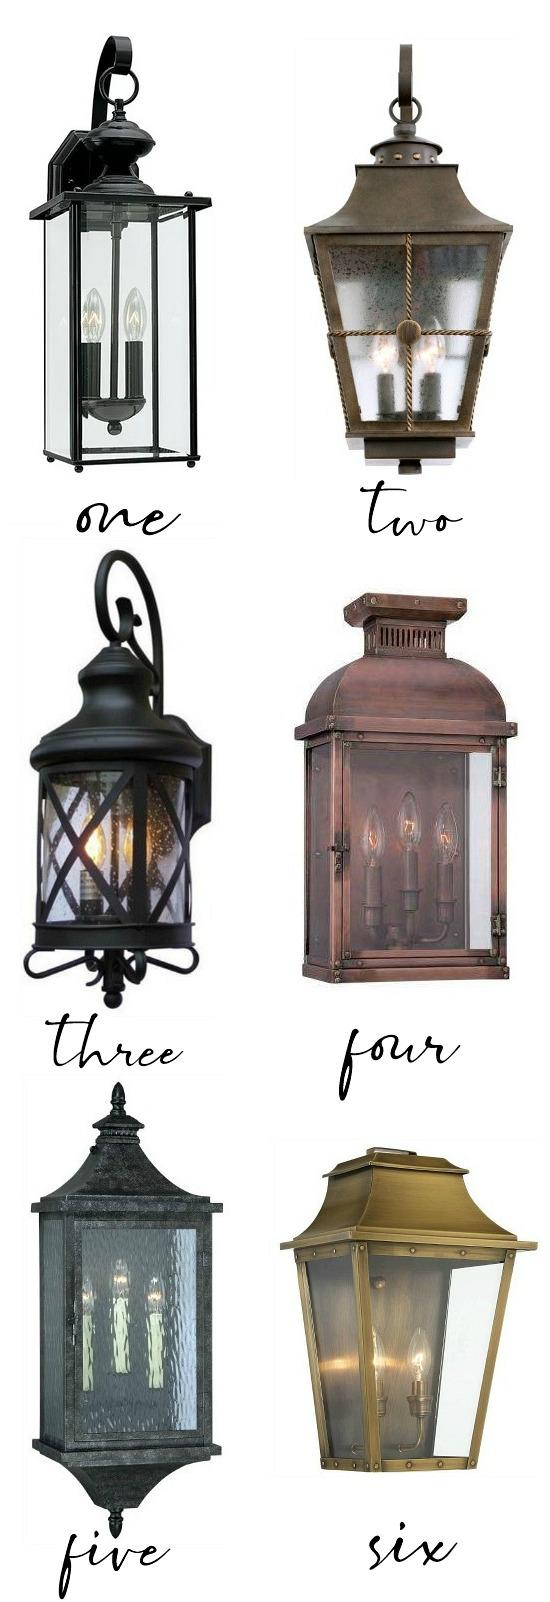 outdoor-wall-mounted-lighting